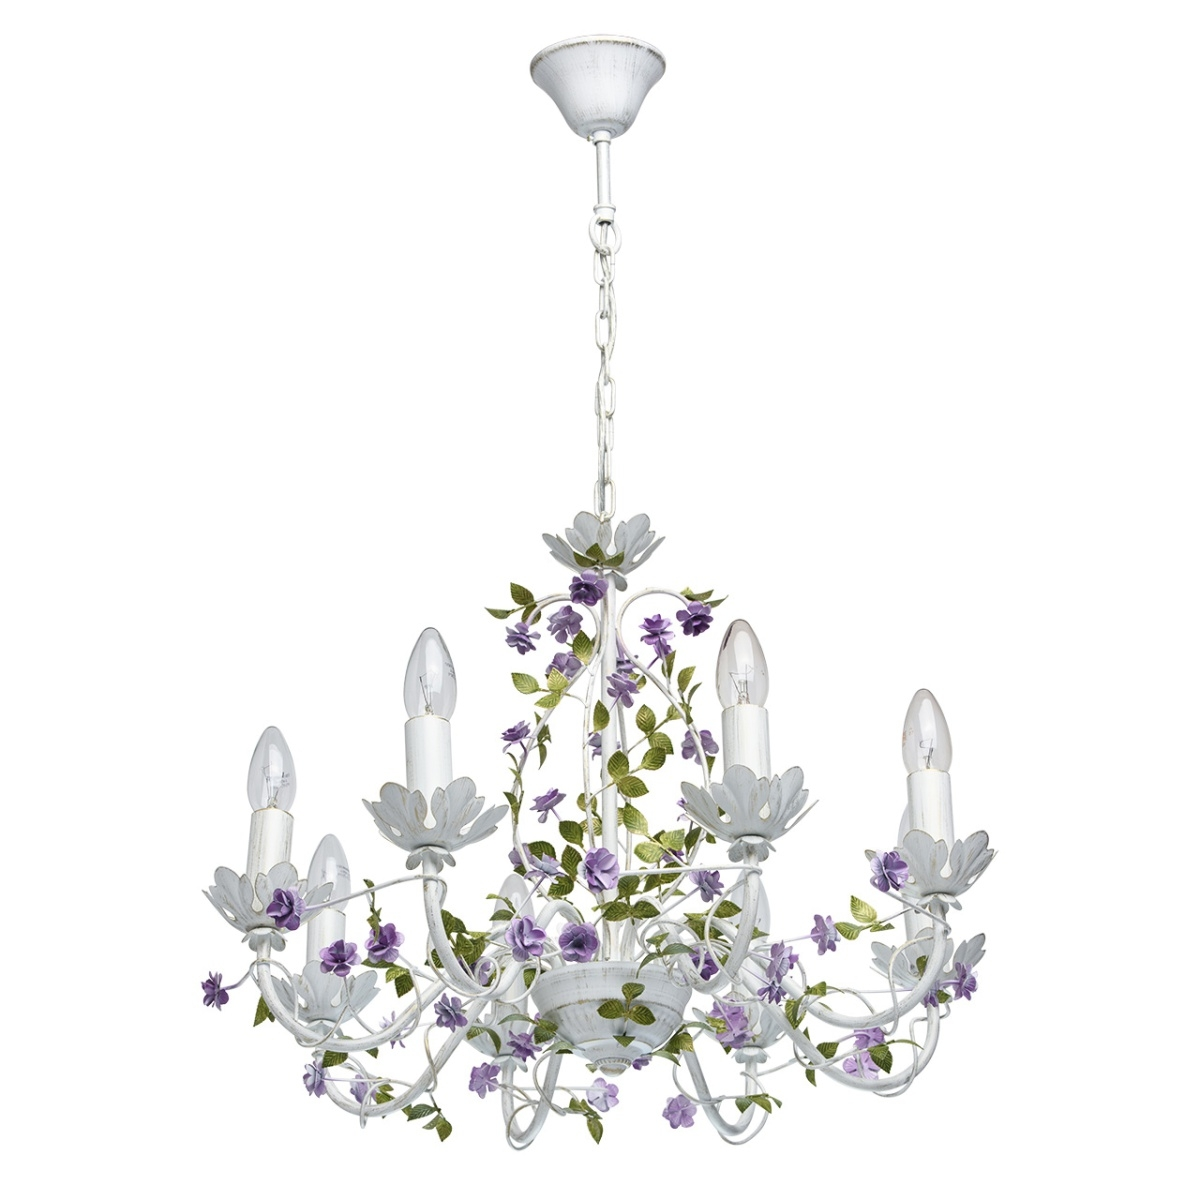 Candelabru MW-Light Flora 421014308 vivre.ro